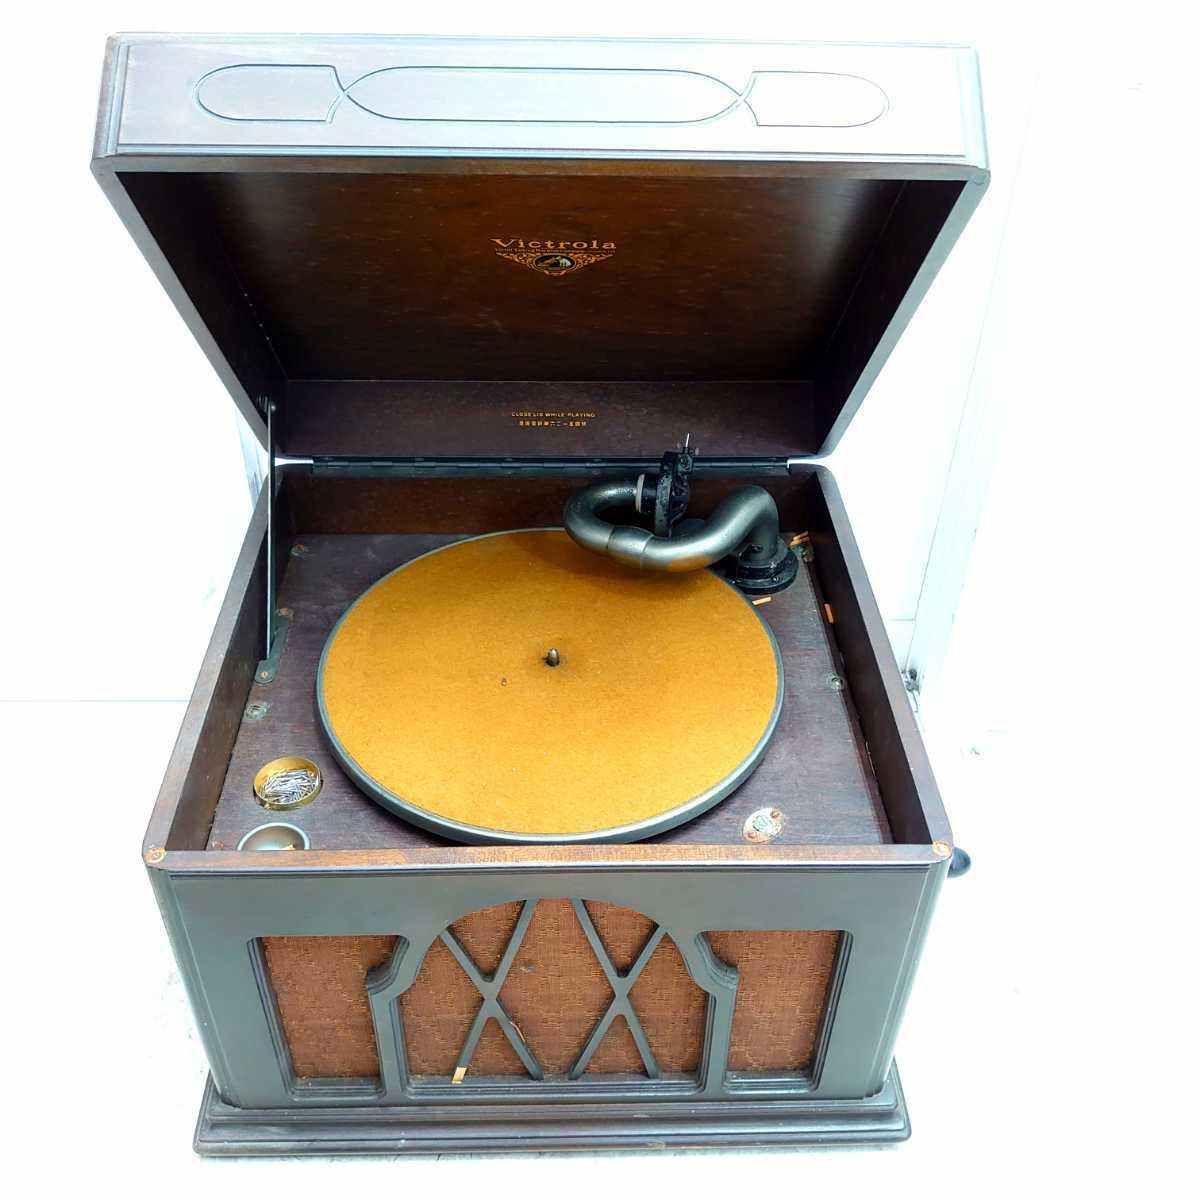 ◆Victrola Victor 蓄音機◆横約45cm/高さ約34cm/奥行約41.5cm/ビクター/卓上/レコード/アンティーク/コレクション/レトロ/替え針付/手動式